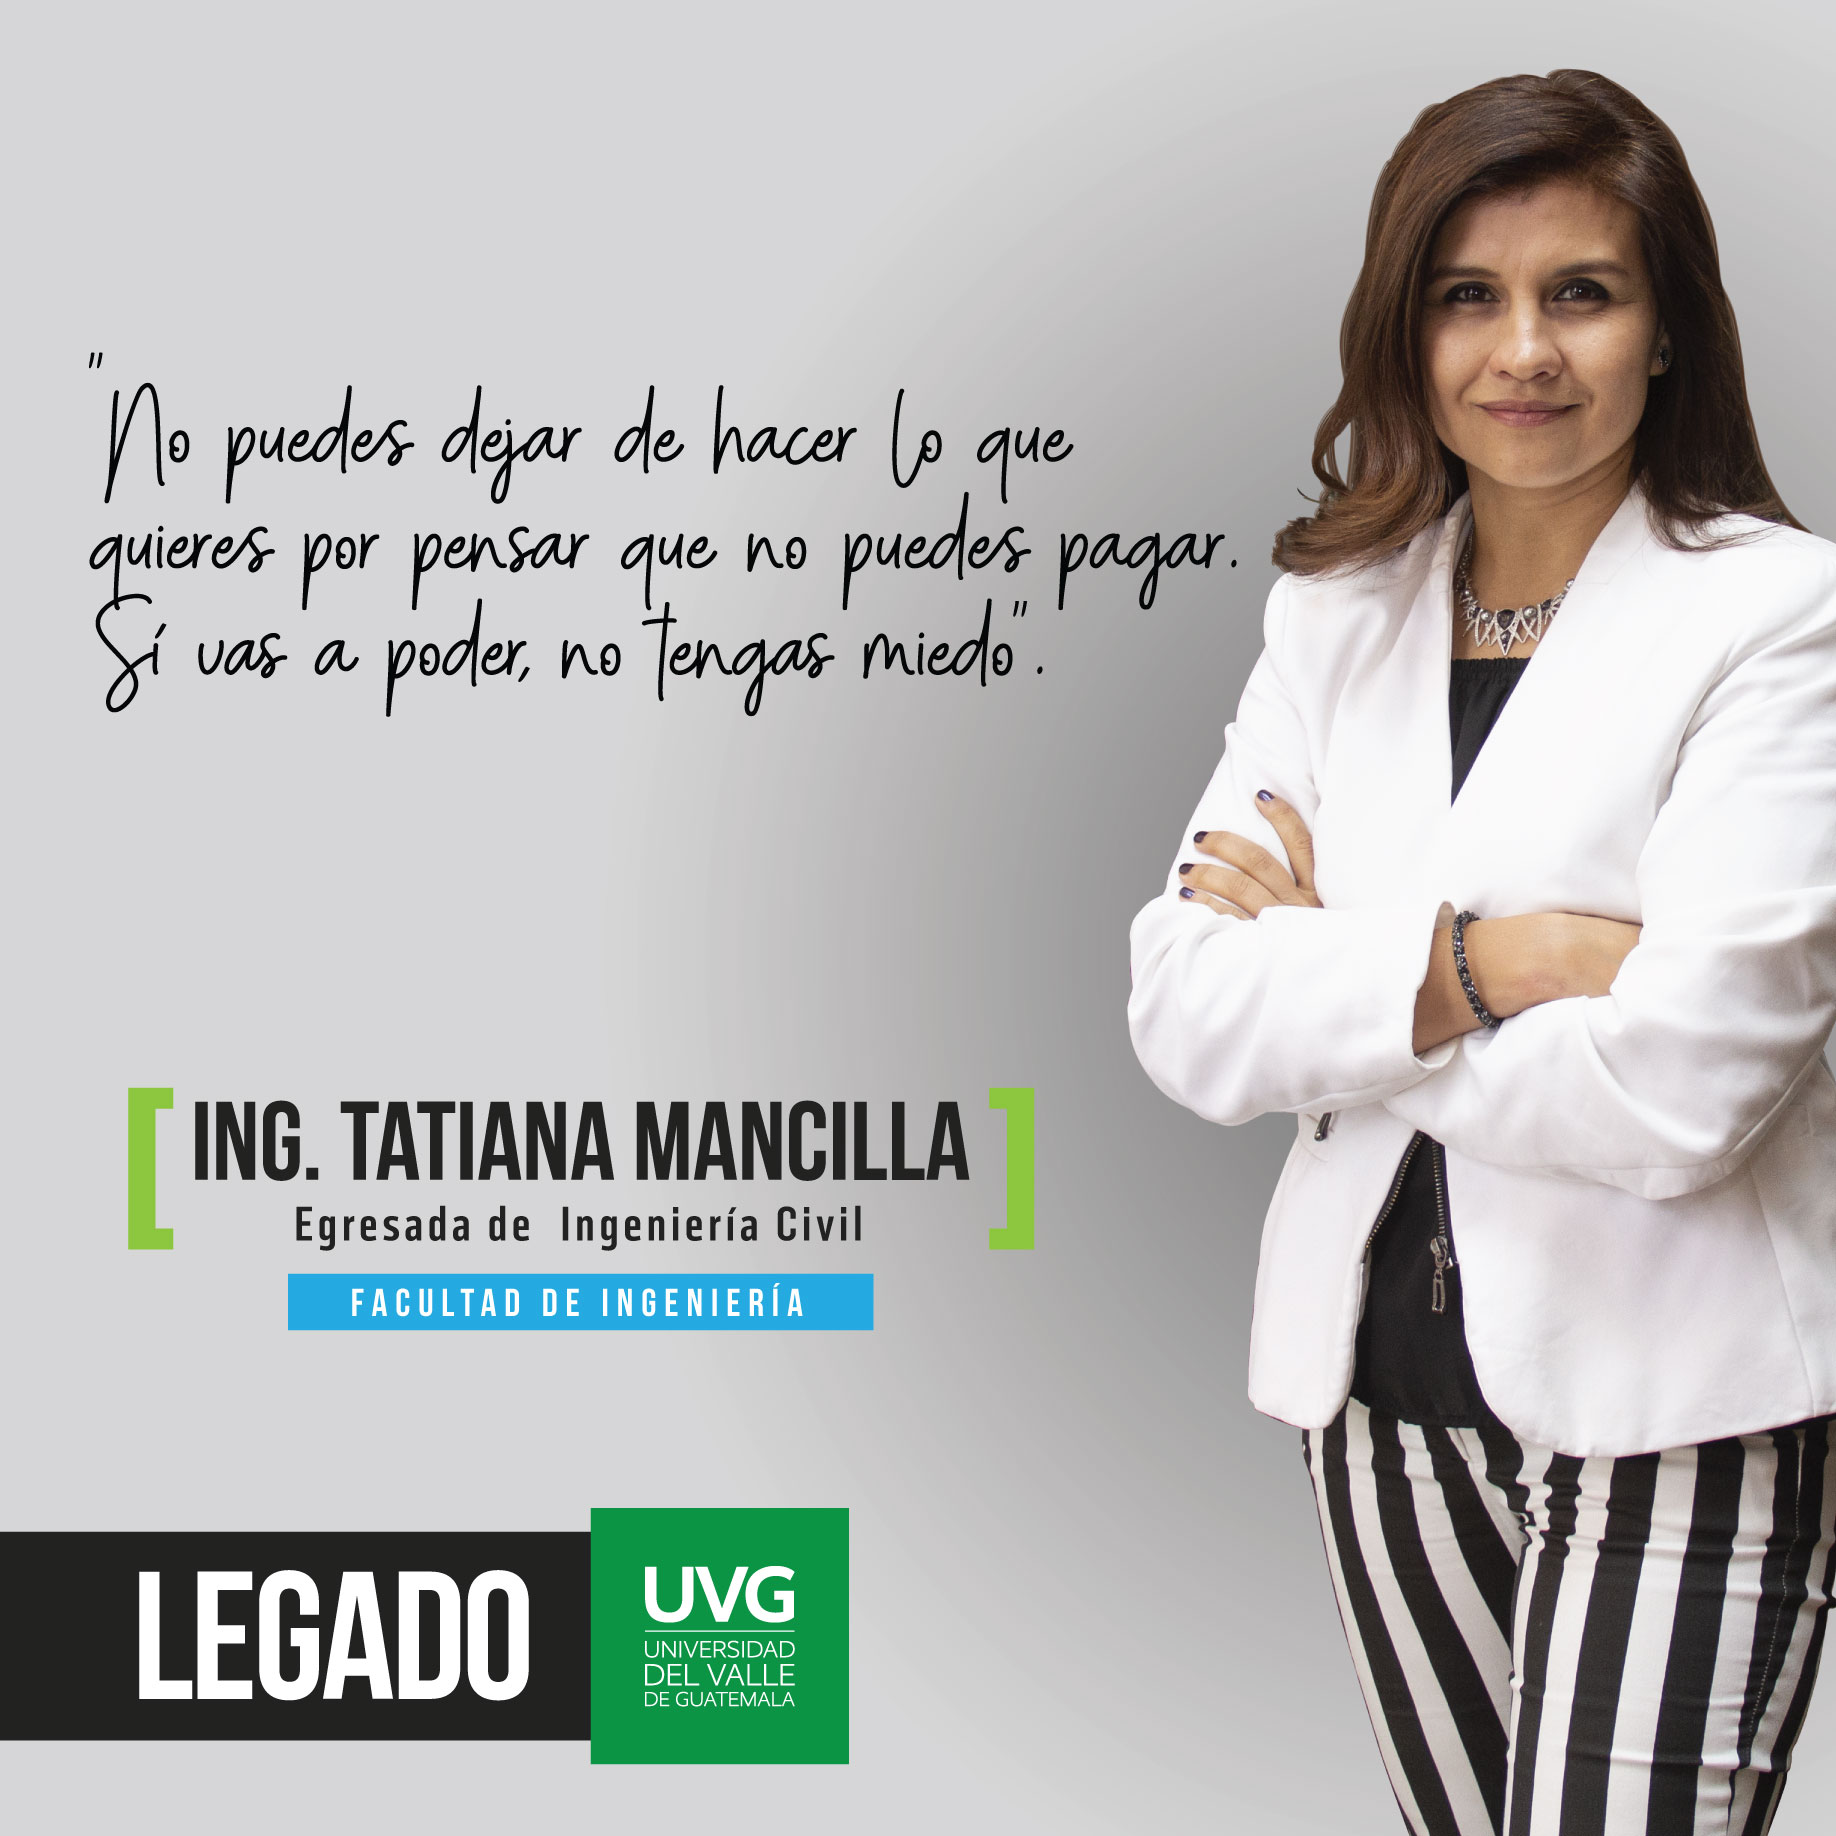 Legado UVG Ing. Tatiana Mancilla